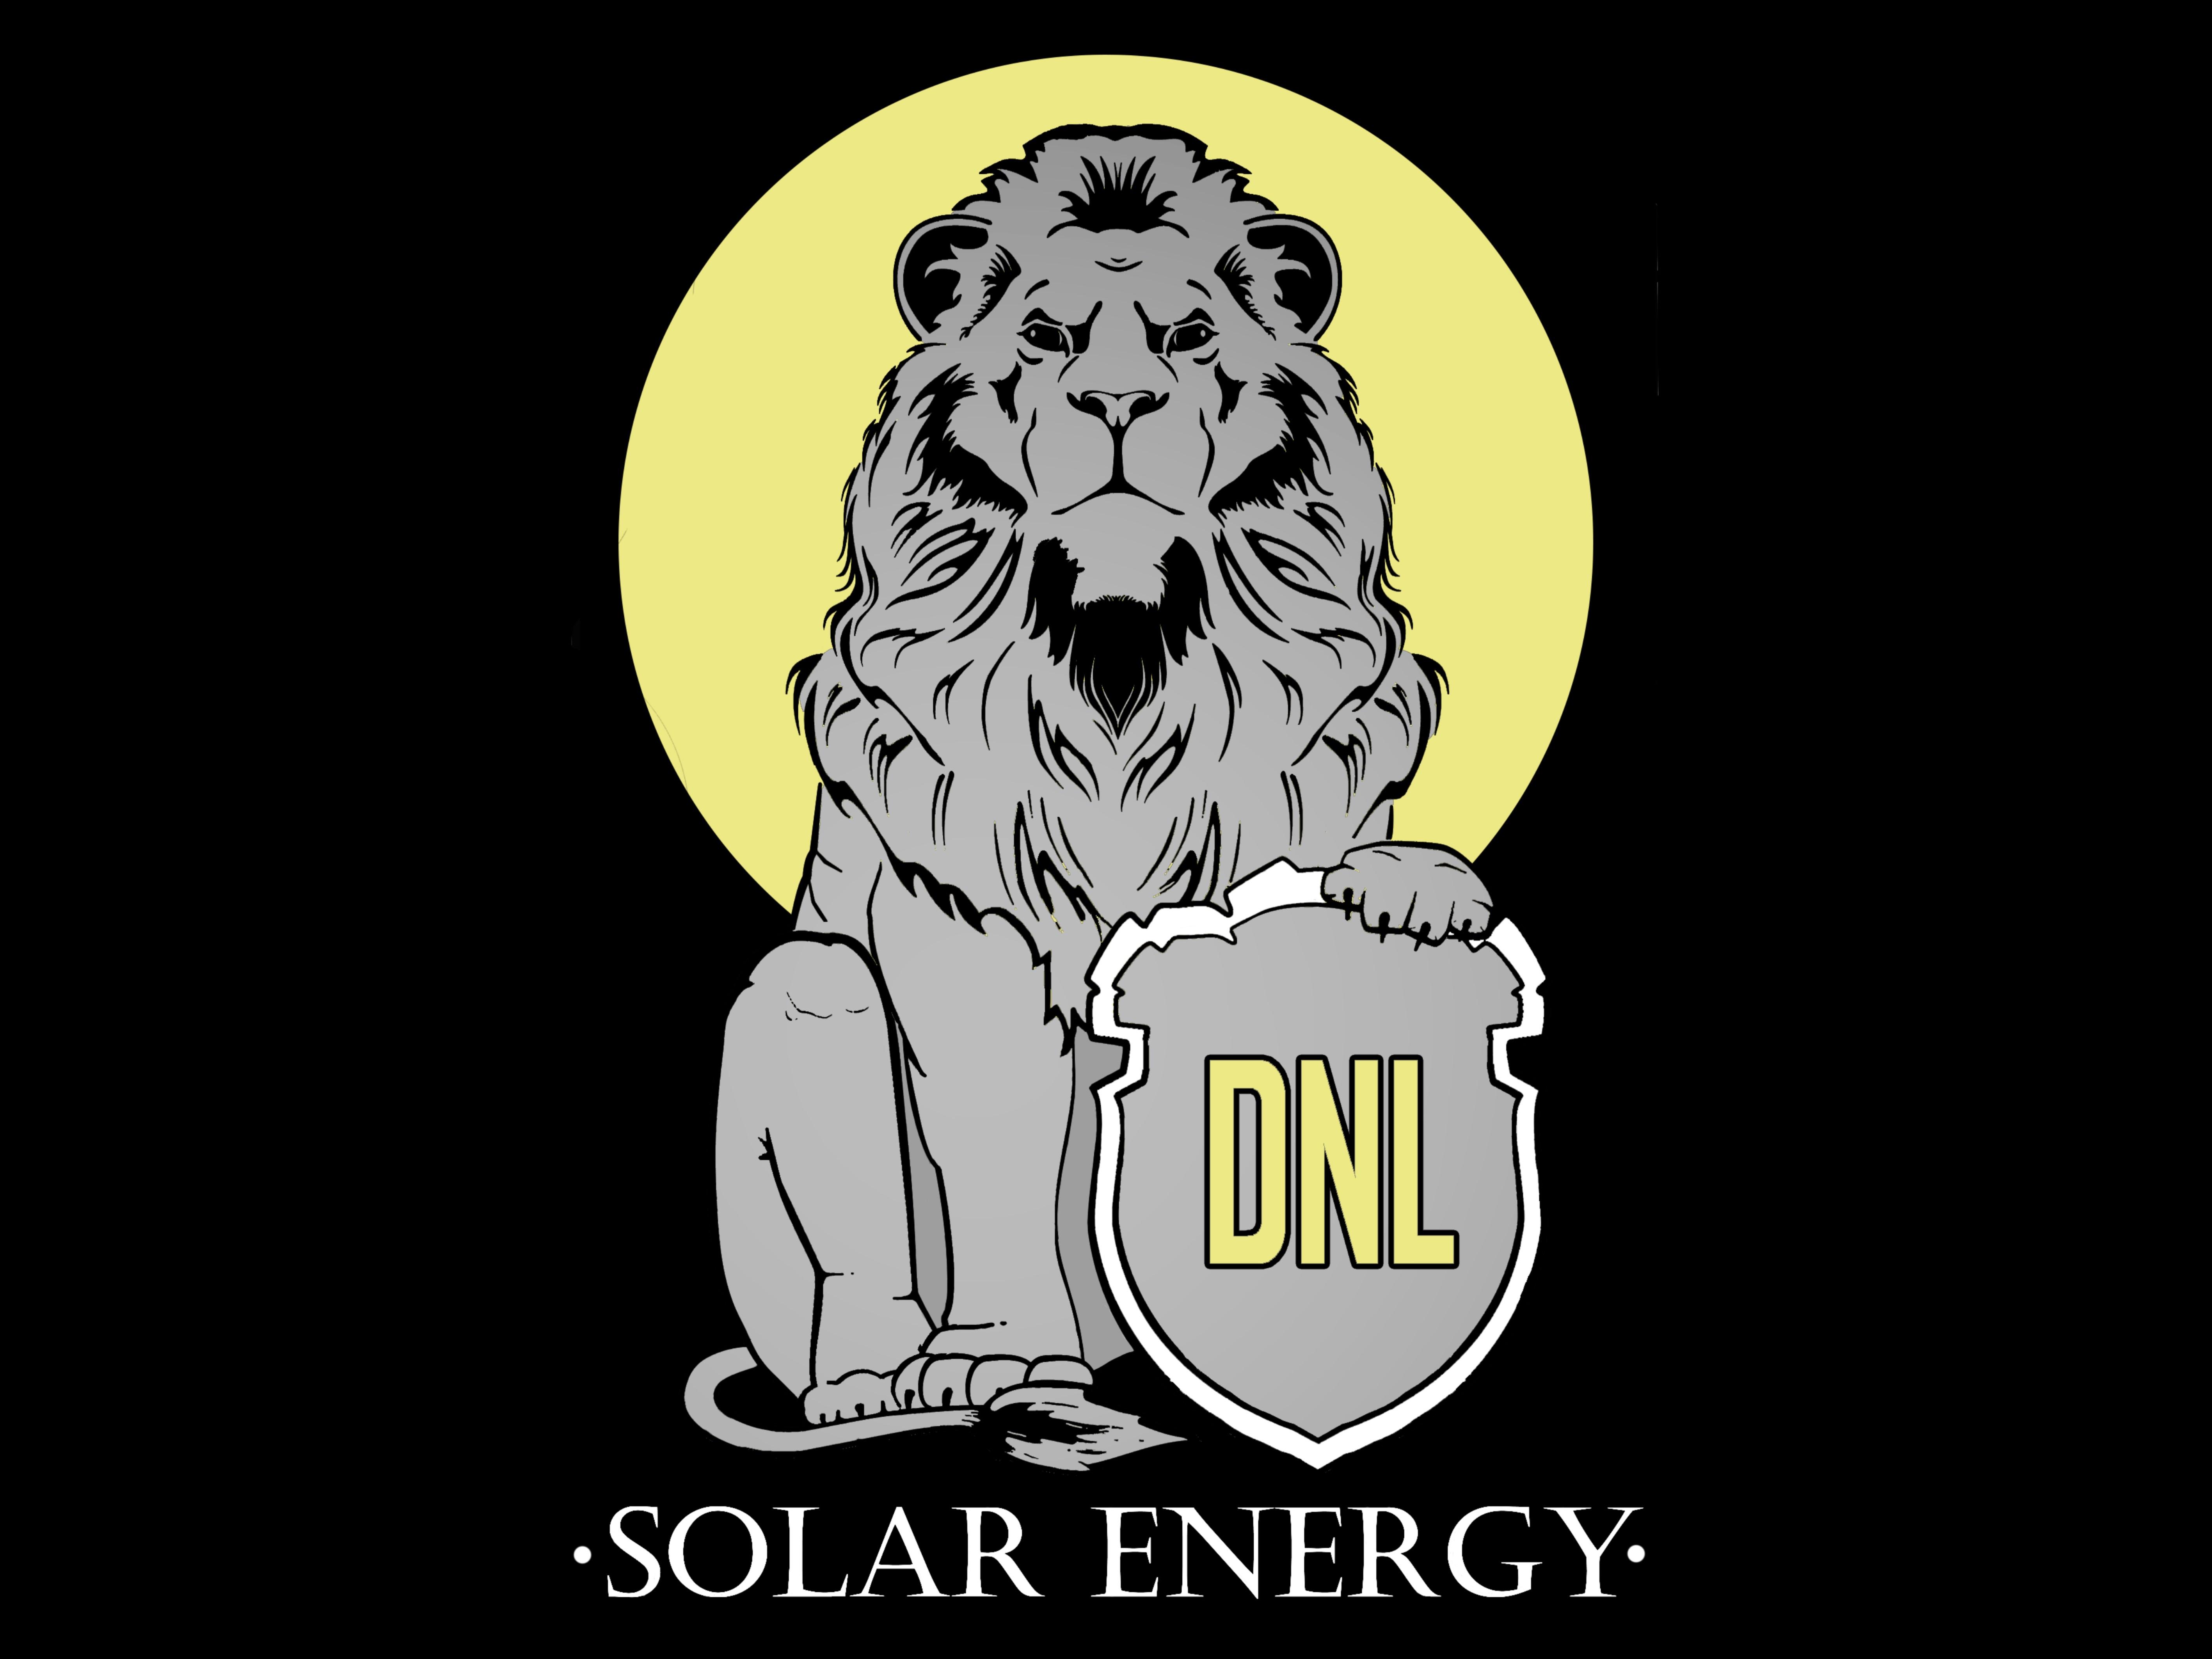 Логотип компании солнечных электростанций